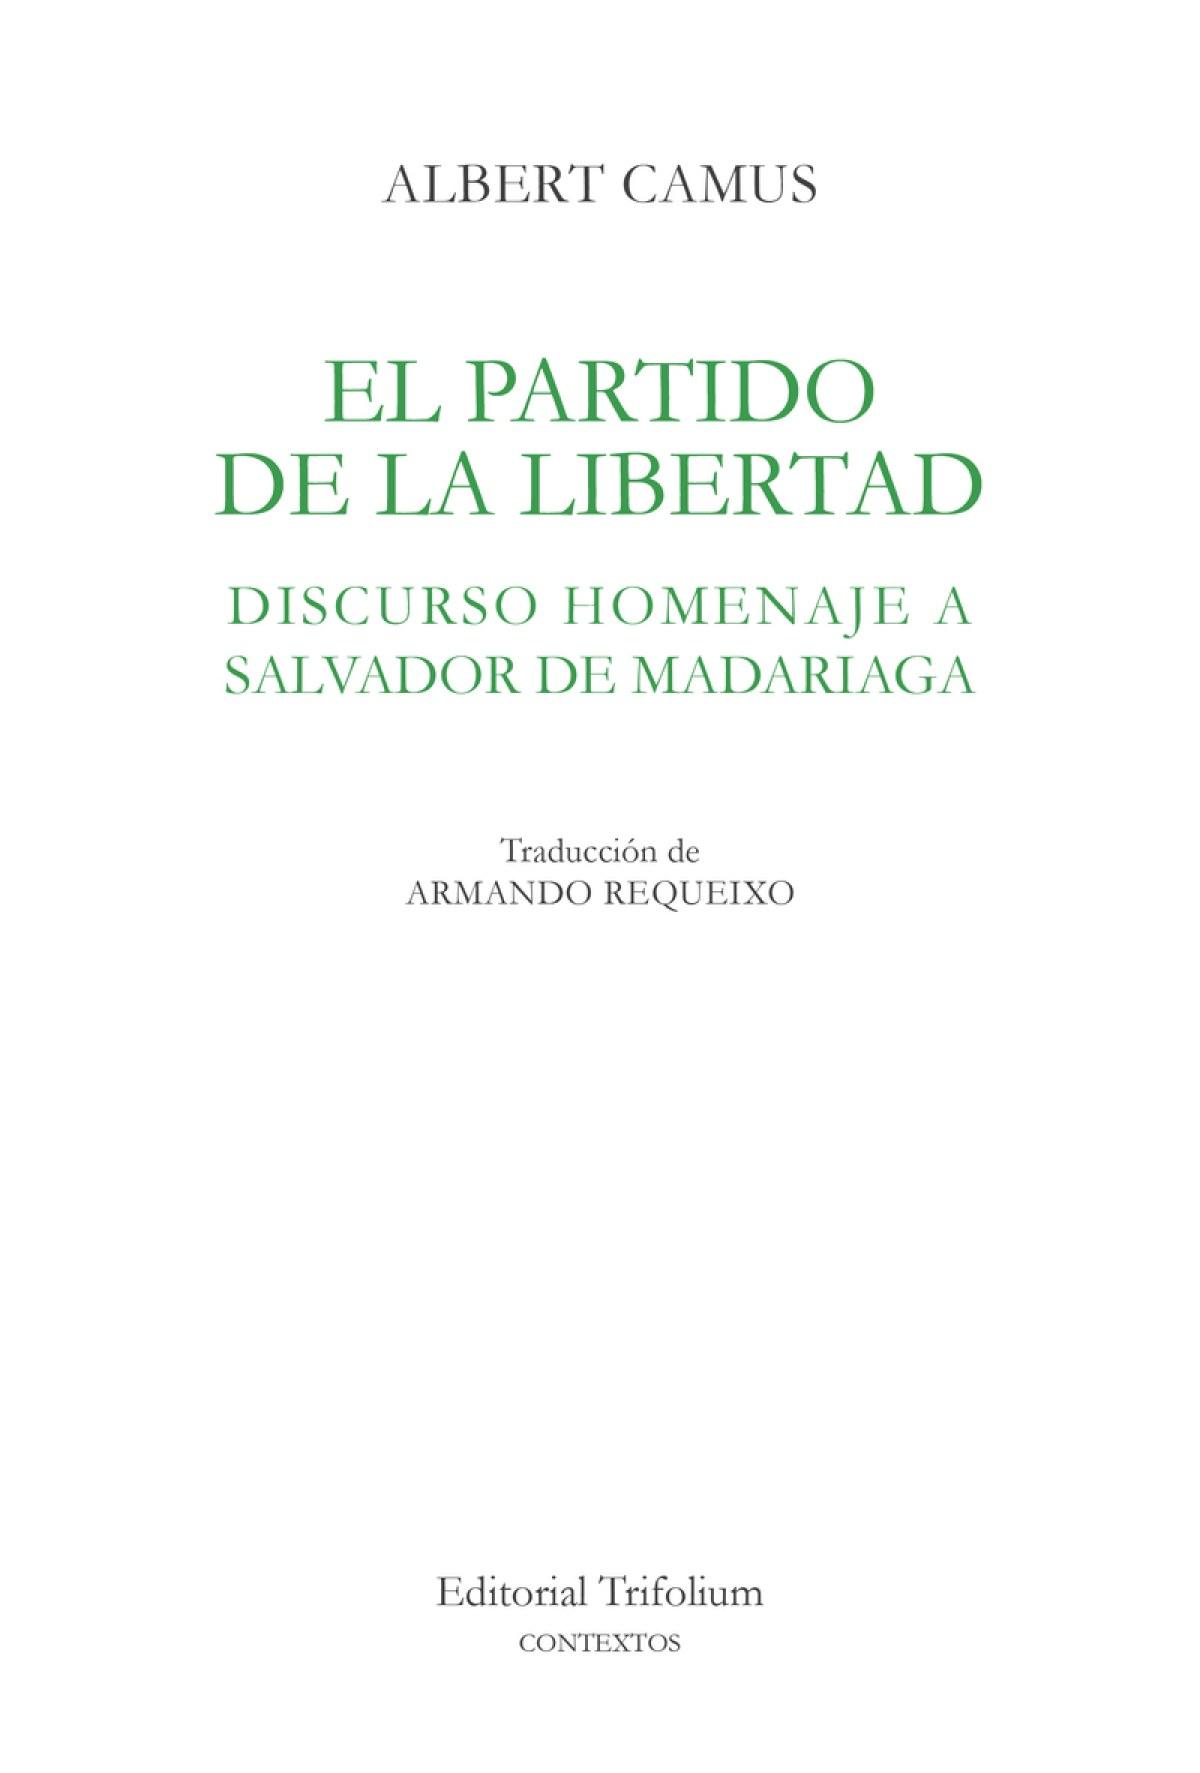 EL PARTIDO DE LA LIBERTAD